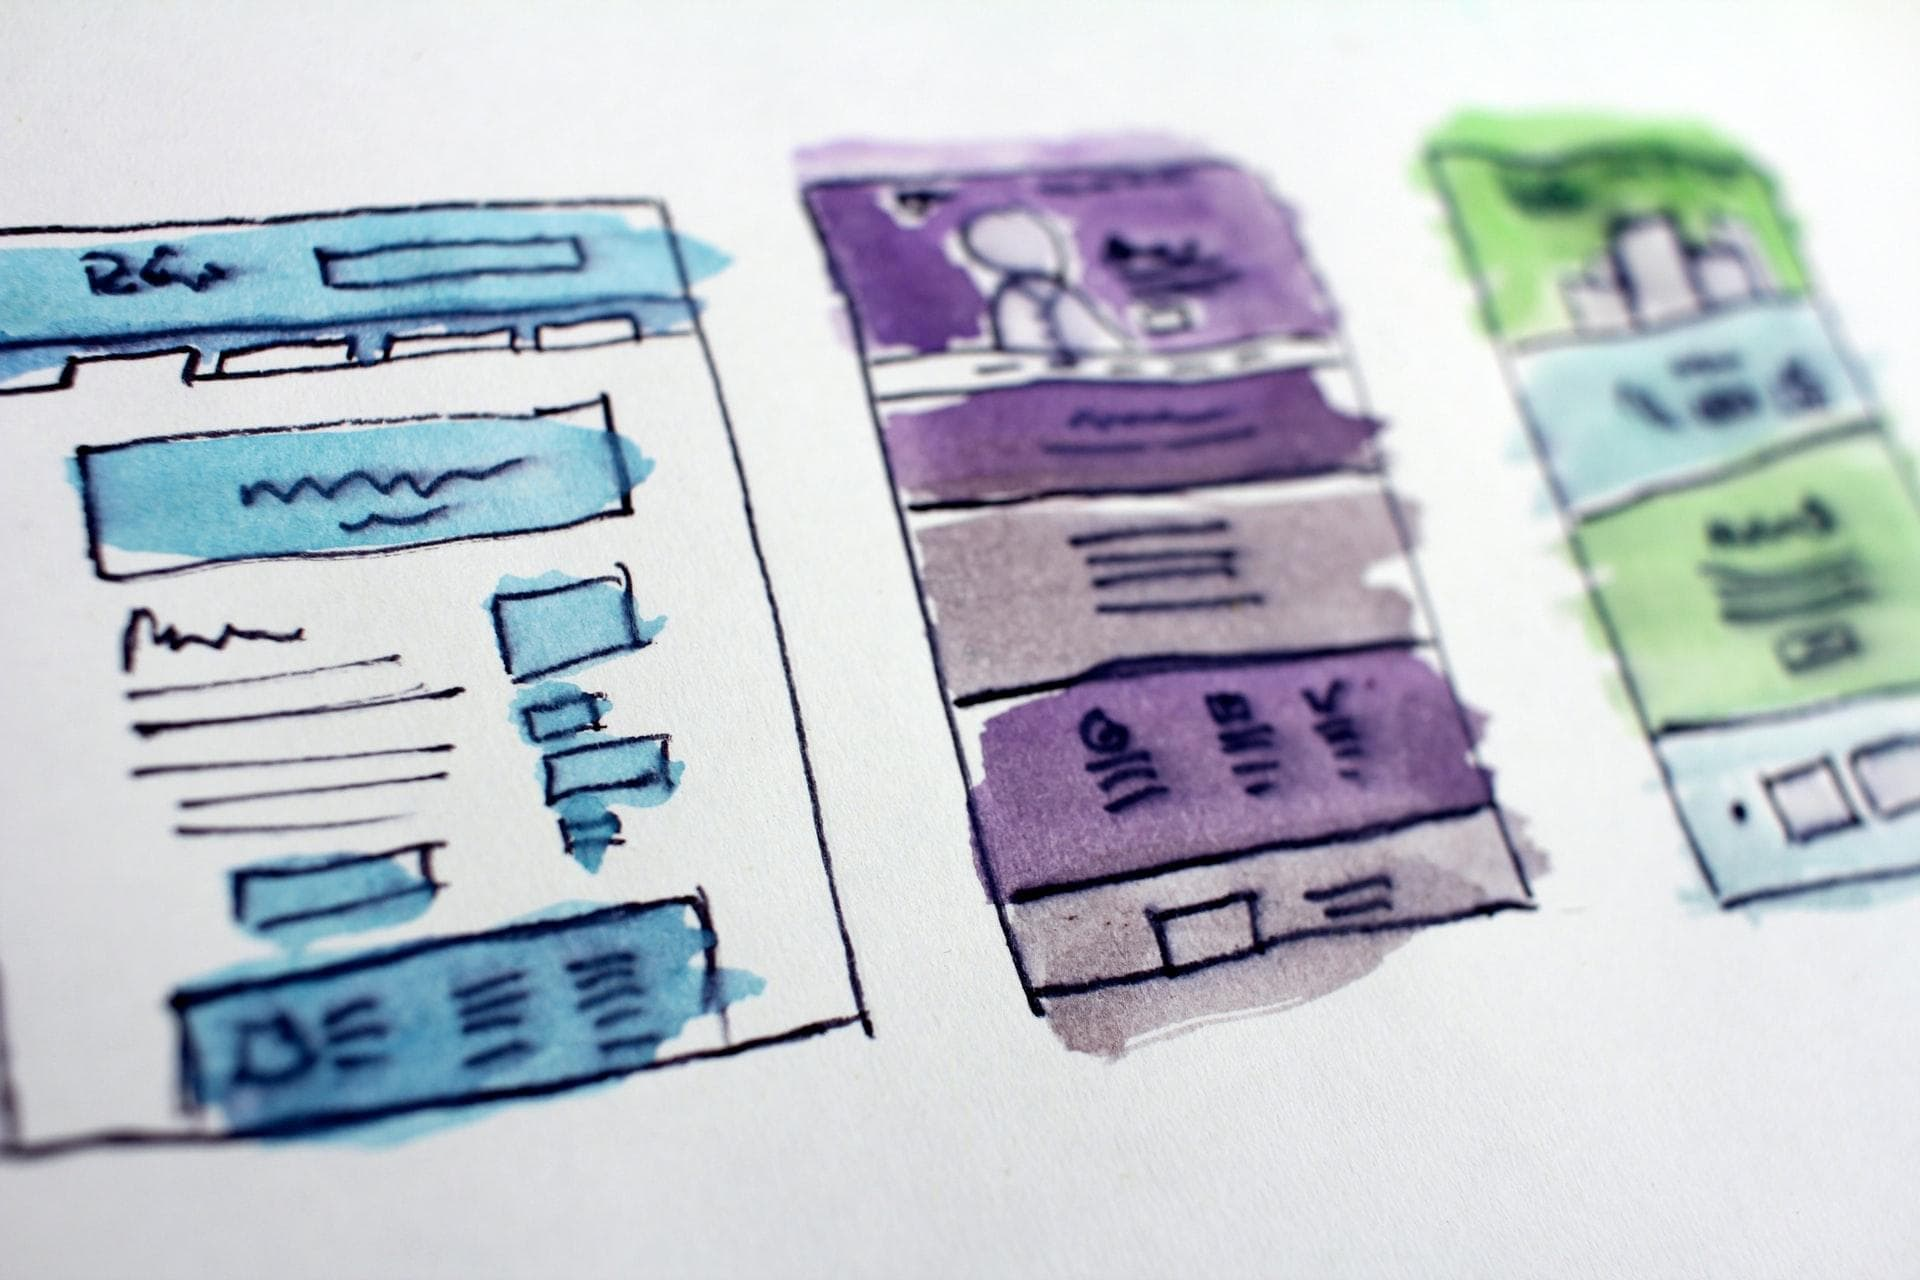 rough drafts of a website design